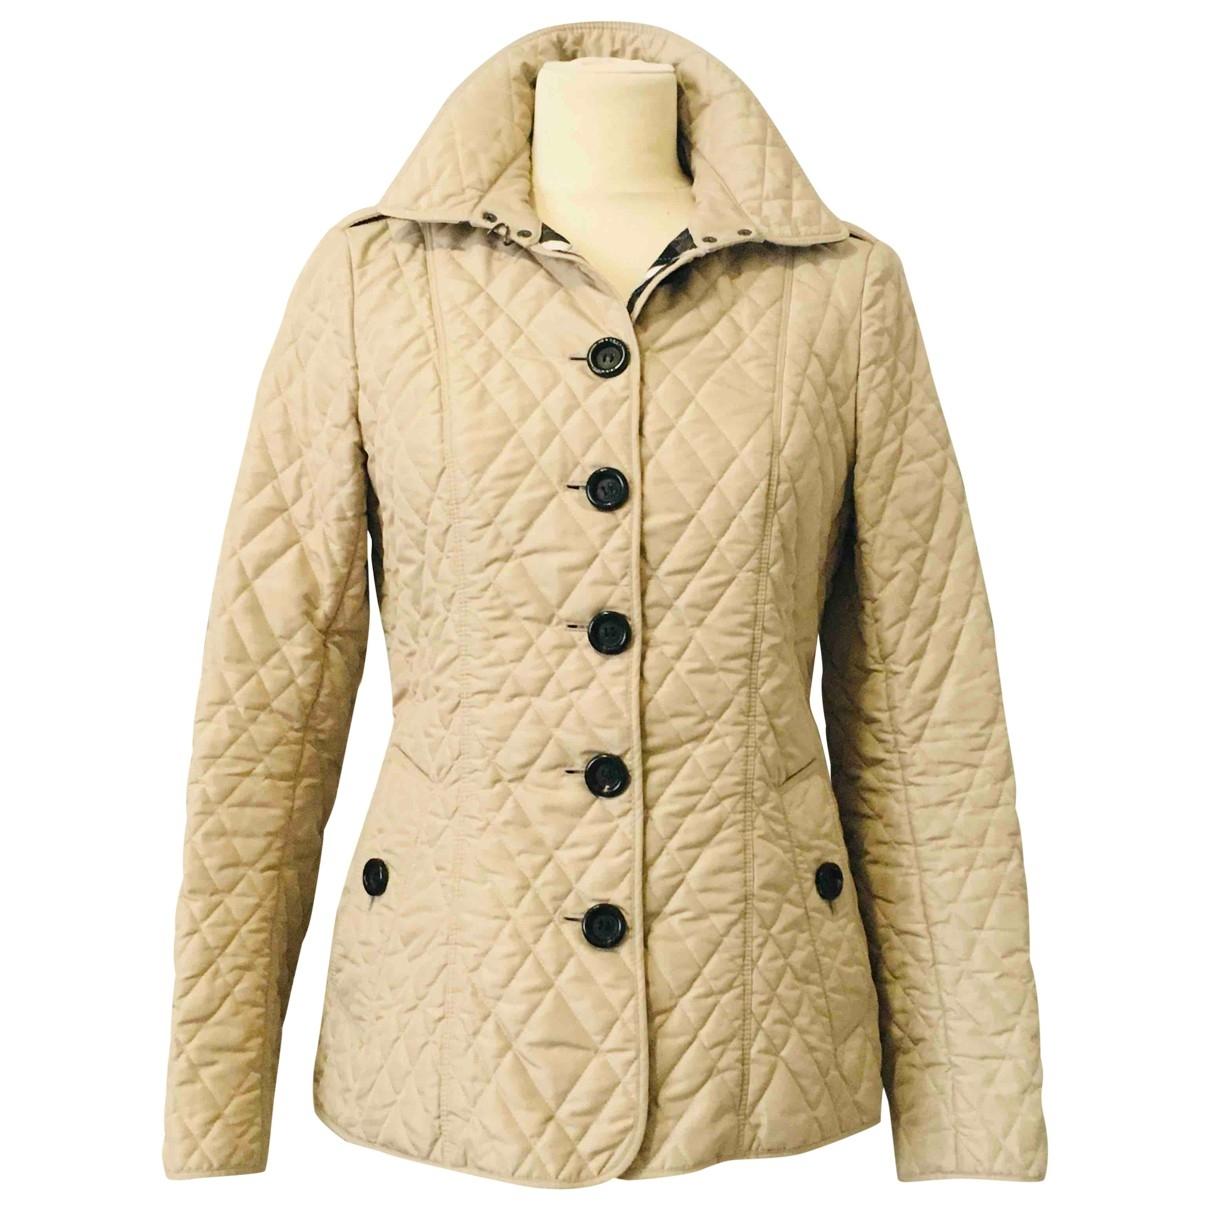 Burberry \N Ecru coat for Women 40 IT